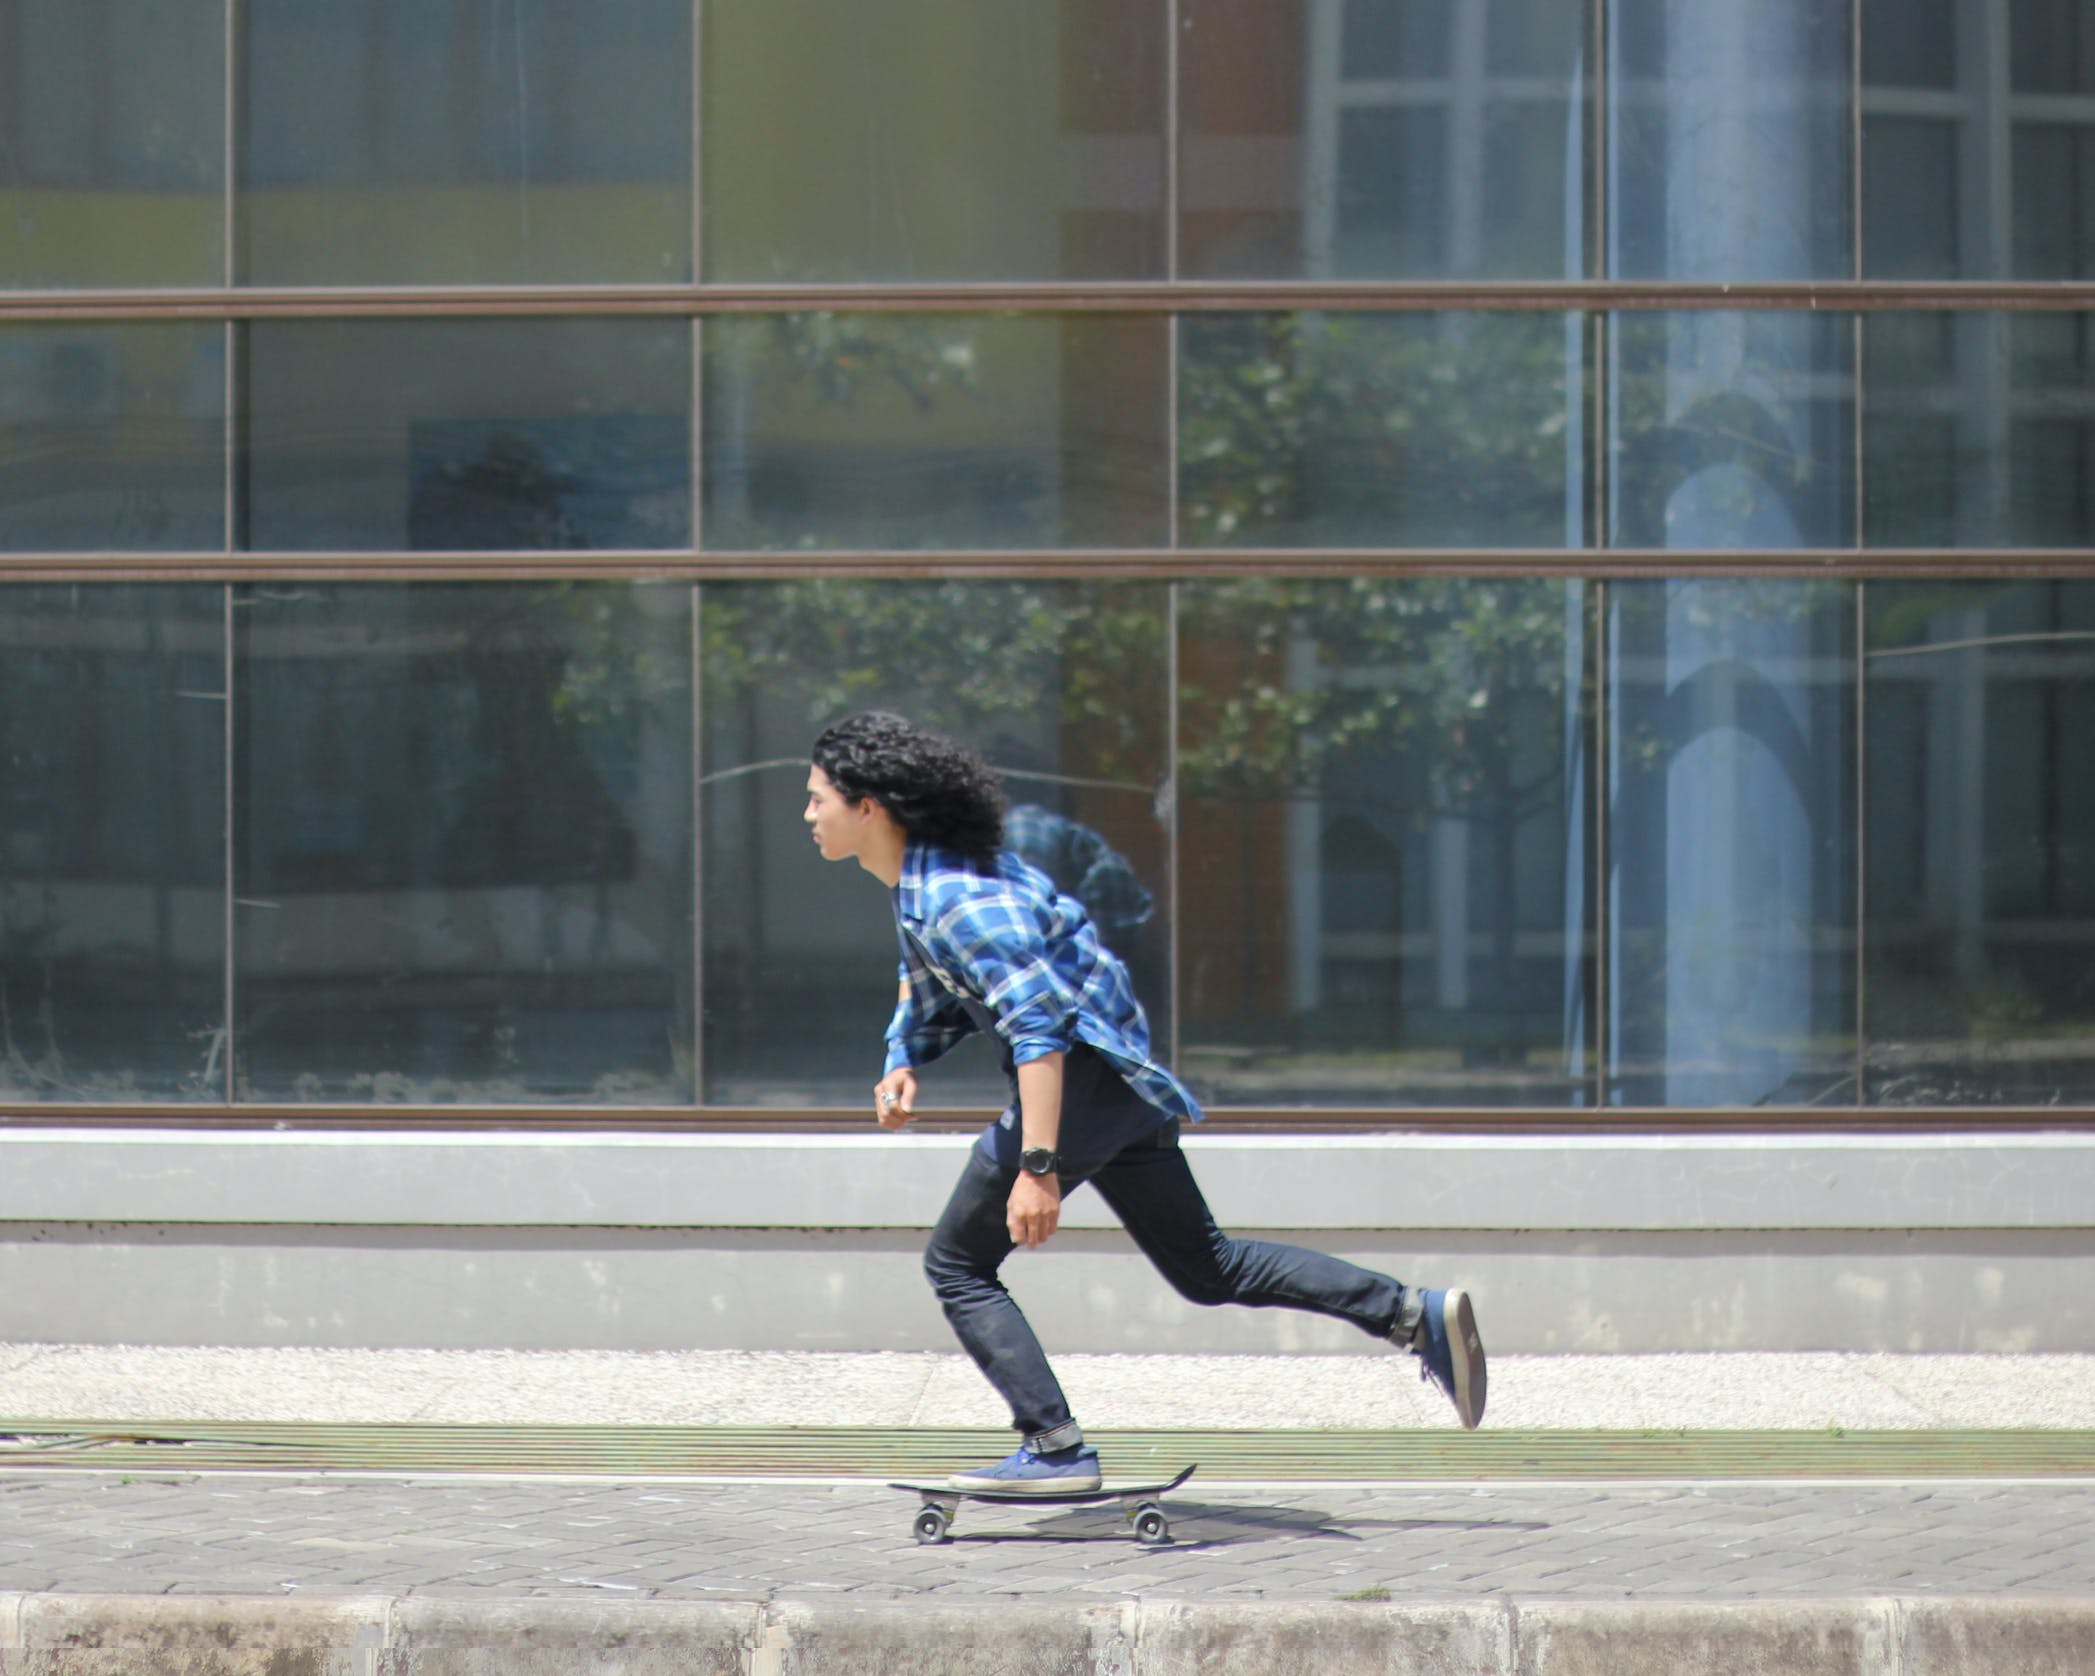 Man in Sport Shirt Riding Skateboard